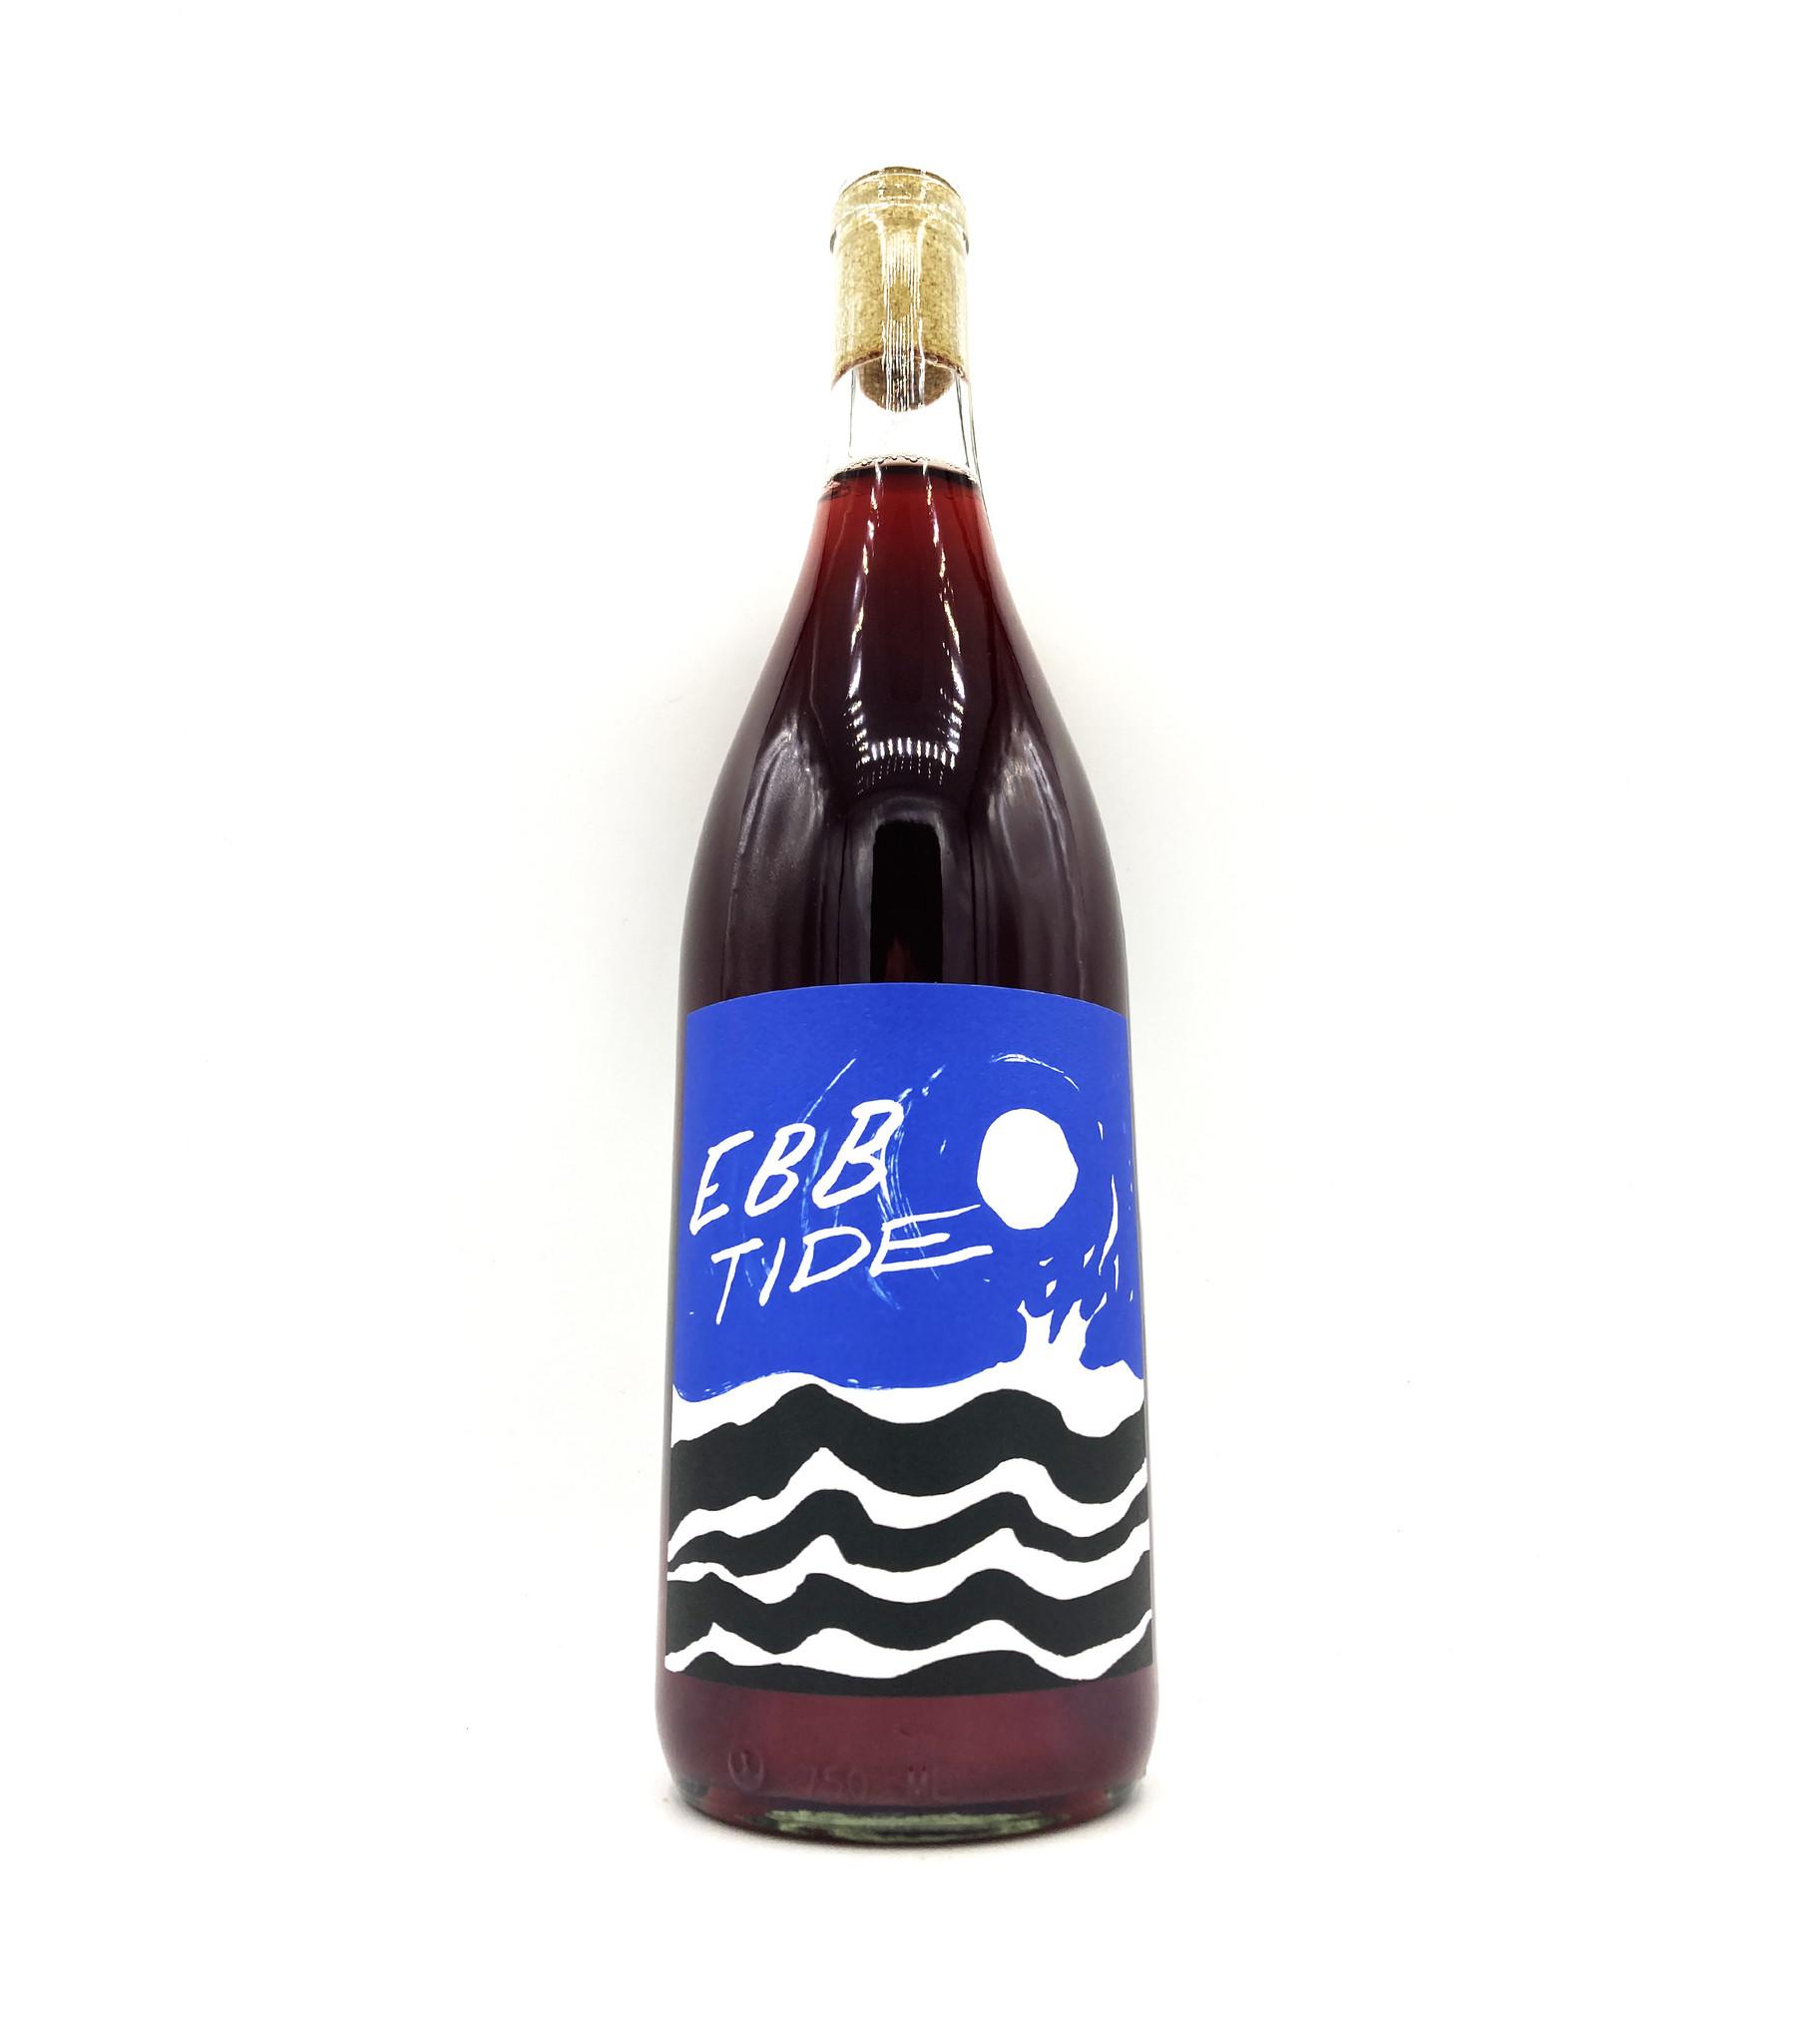 Pinot Gris Ramato 2020 Ebb Tide